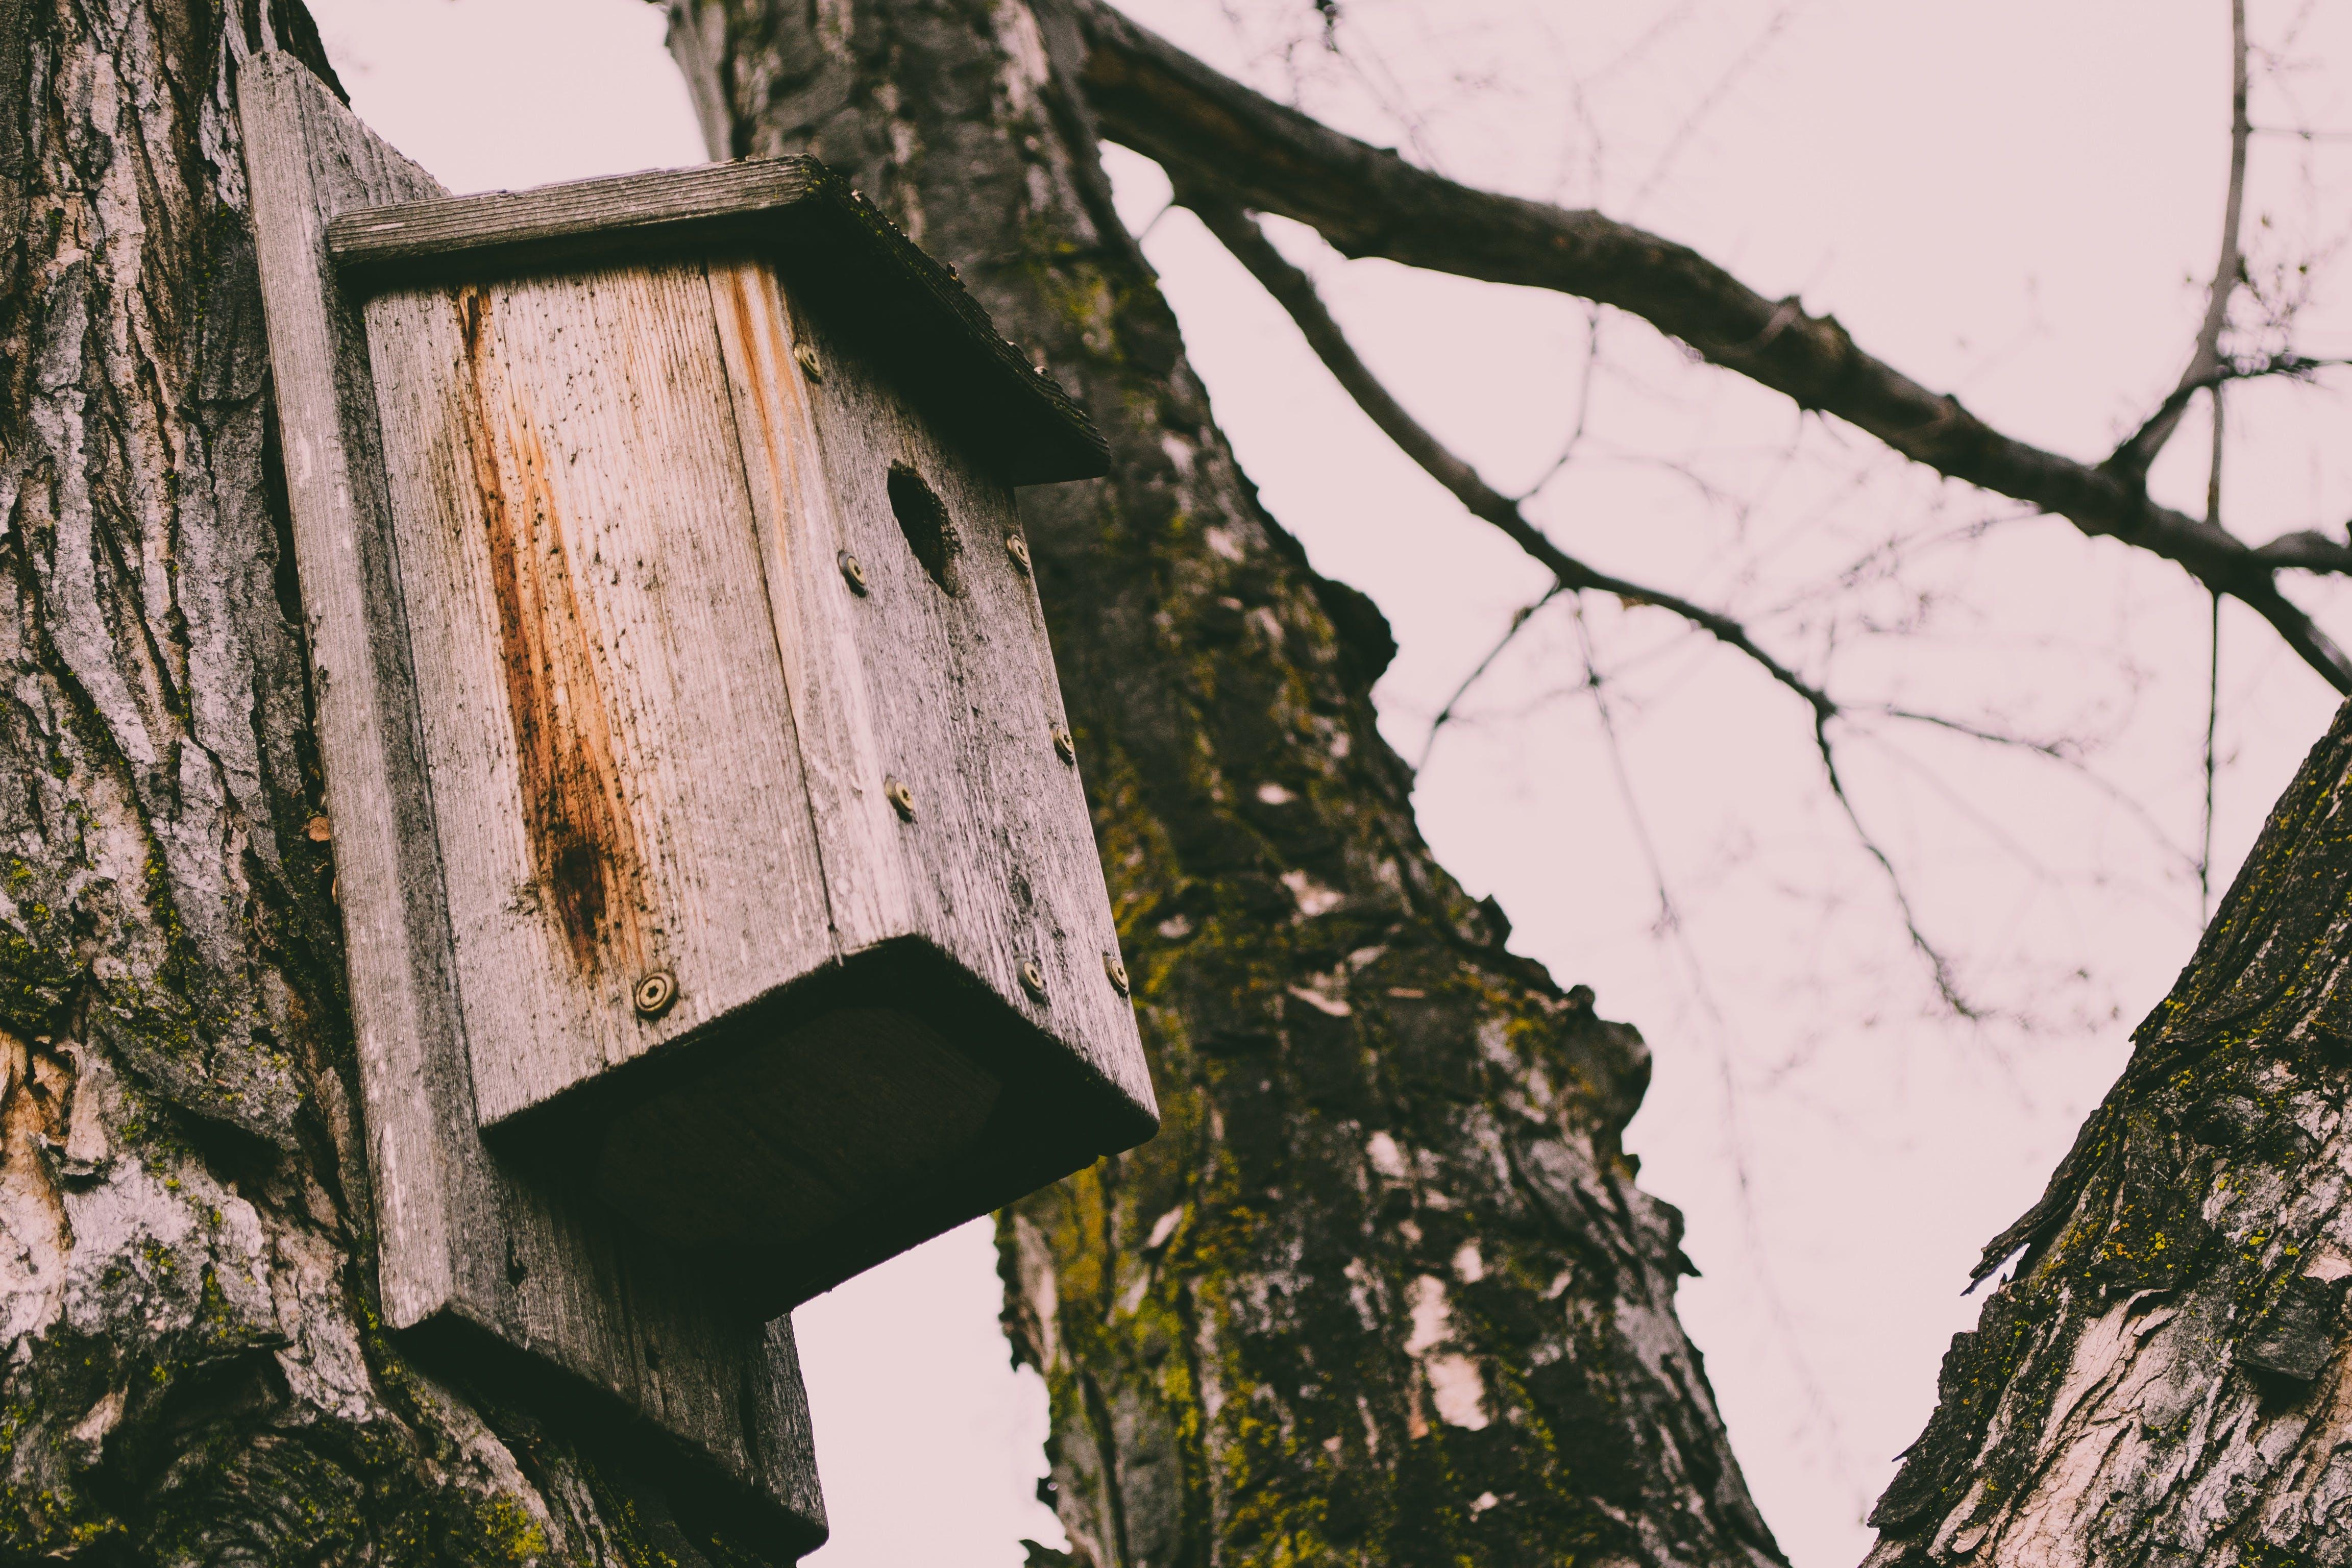 Brown Wooden Bird House on Tree